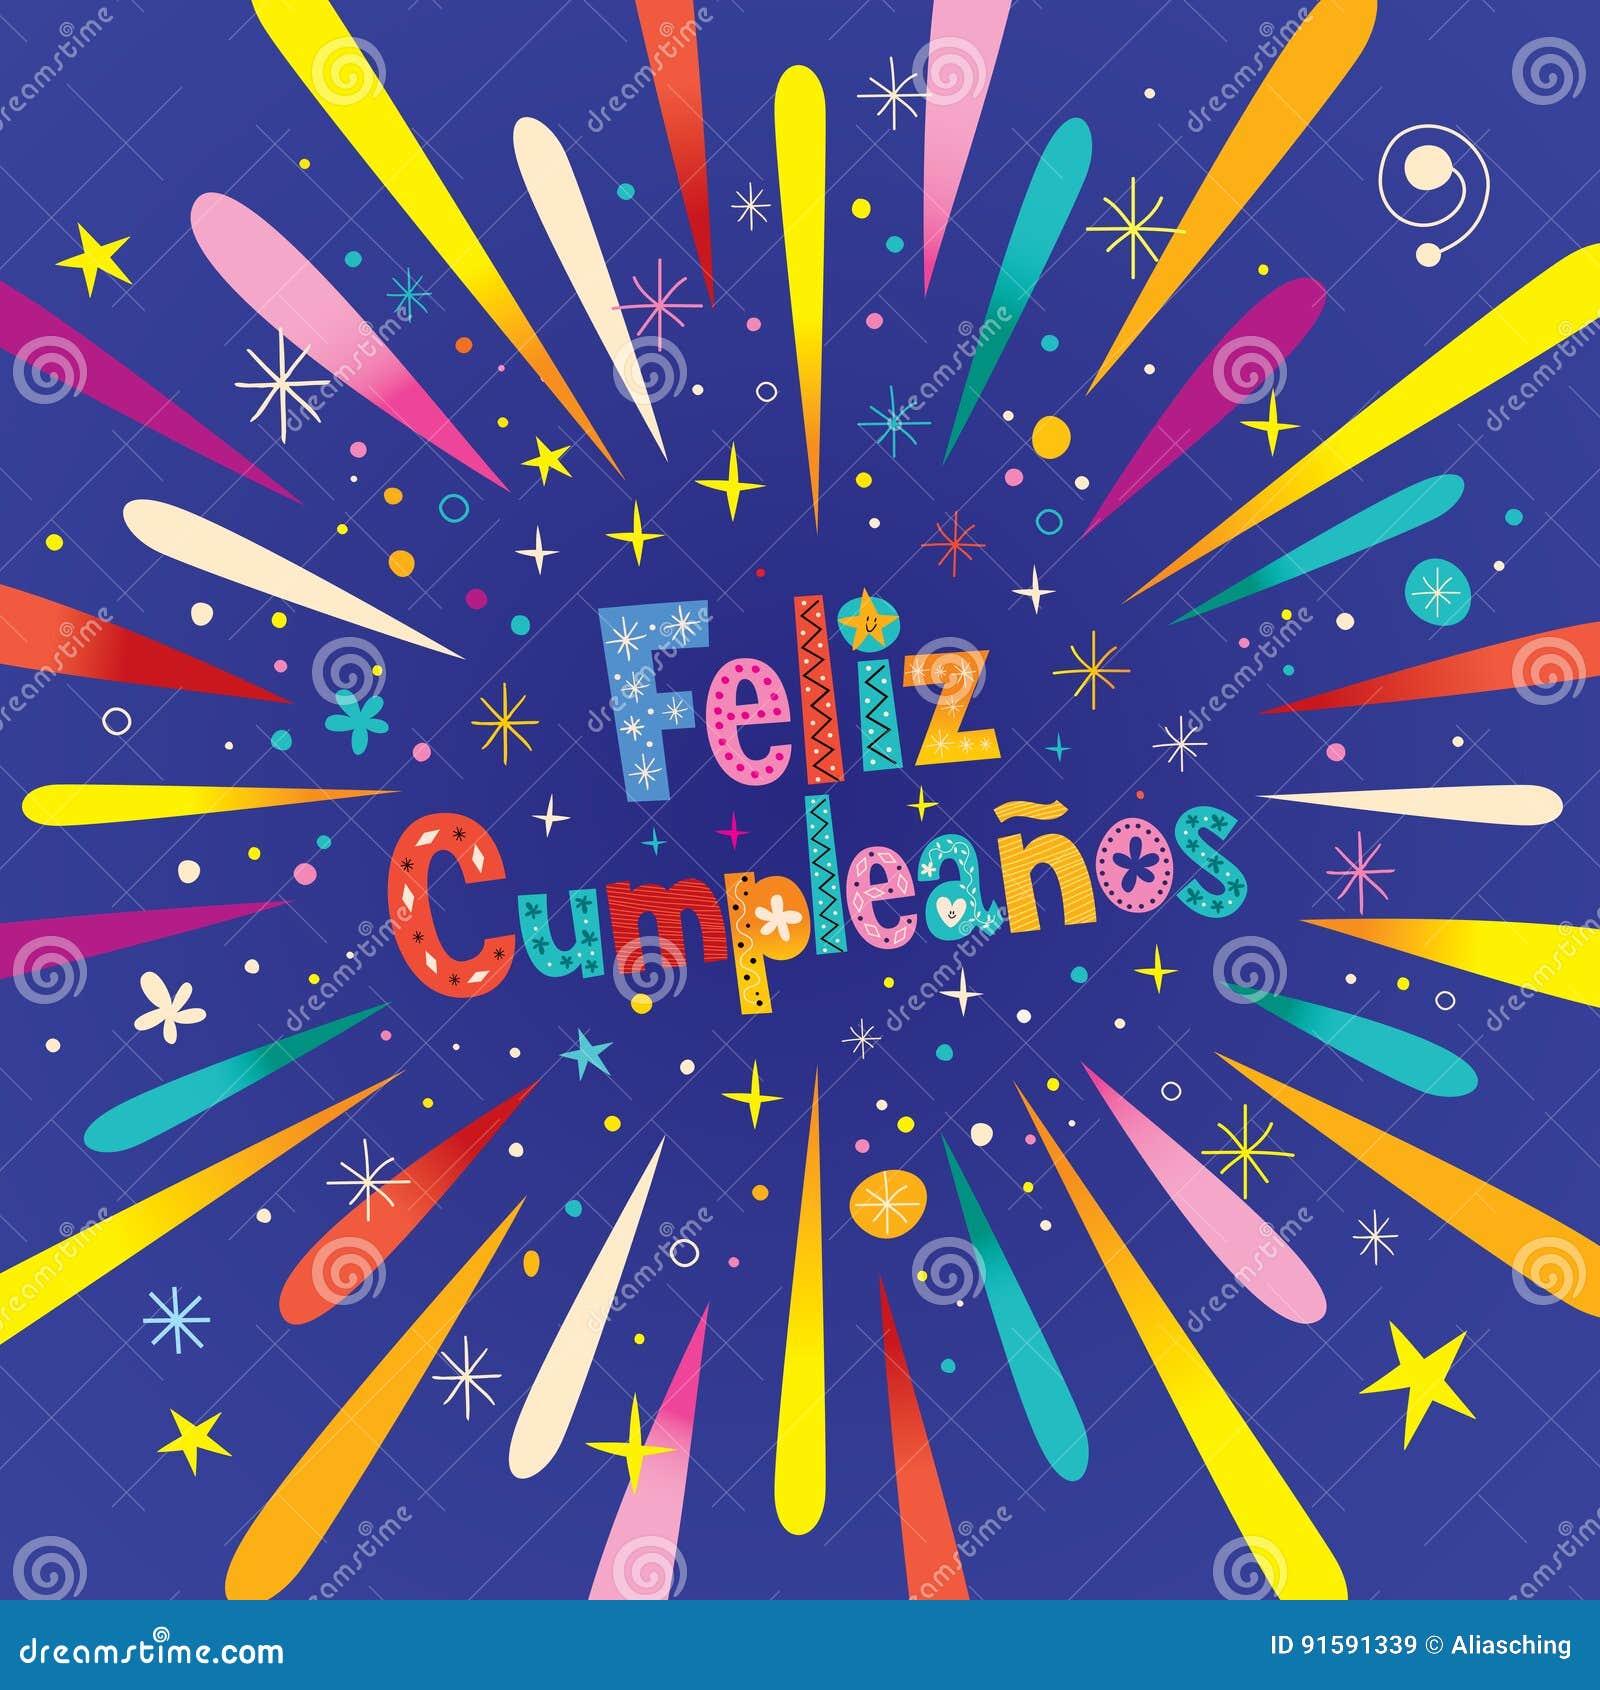 Feliz Cumpleanos   Buon Compleanno Nella Cartolina D'auguri